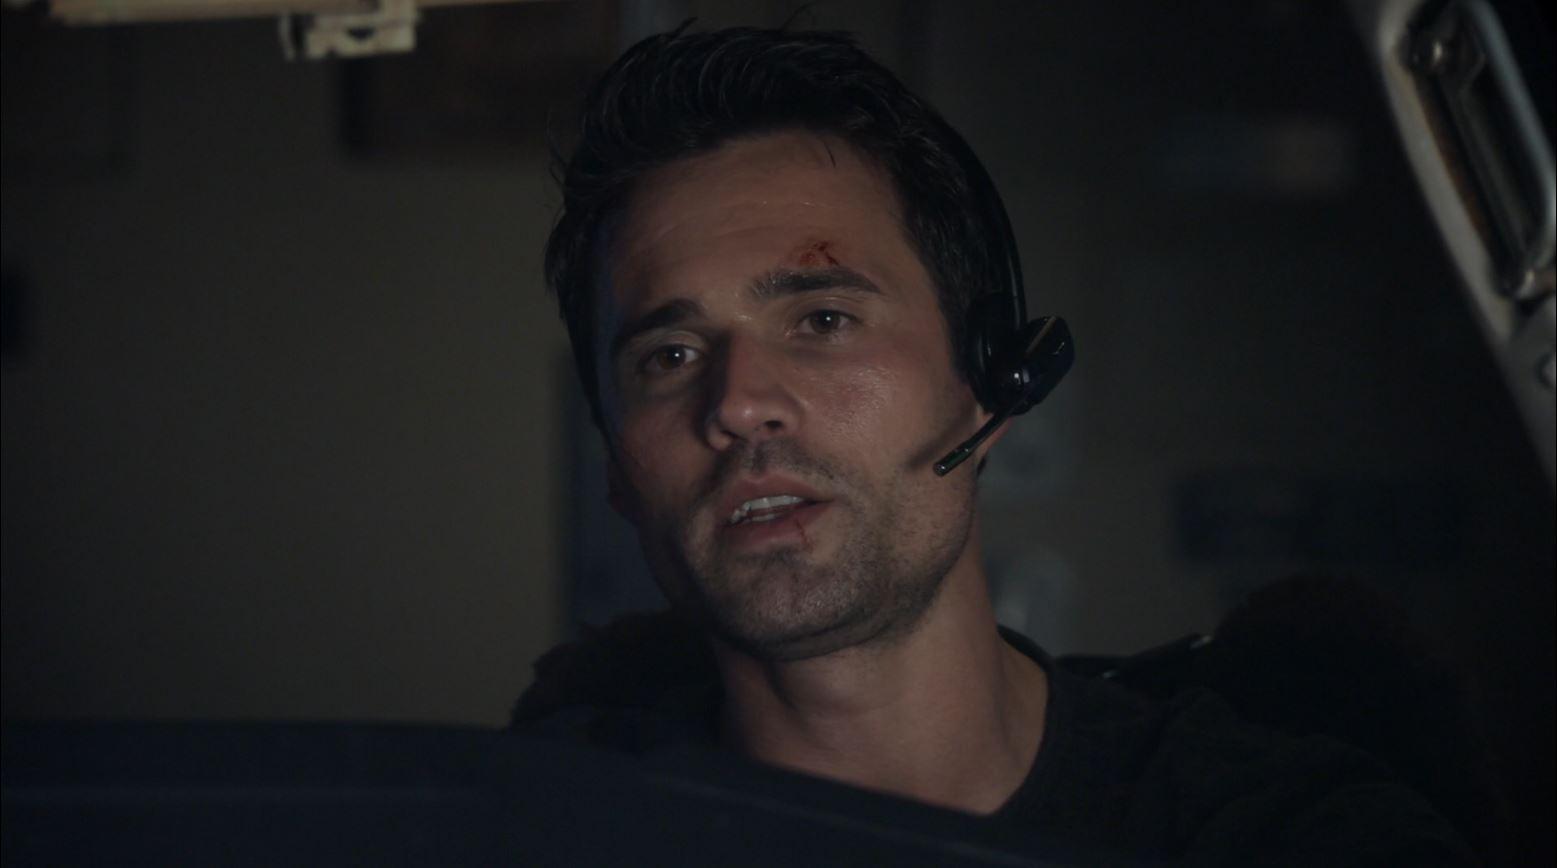 Agents of SHIELD S1Ep20 Nothing Personal - Brett Dalton as Ward